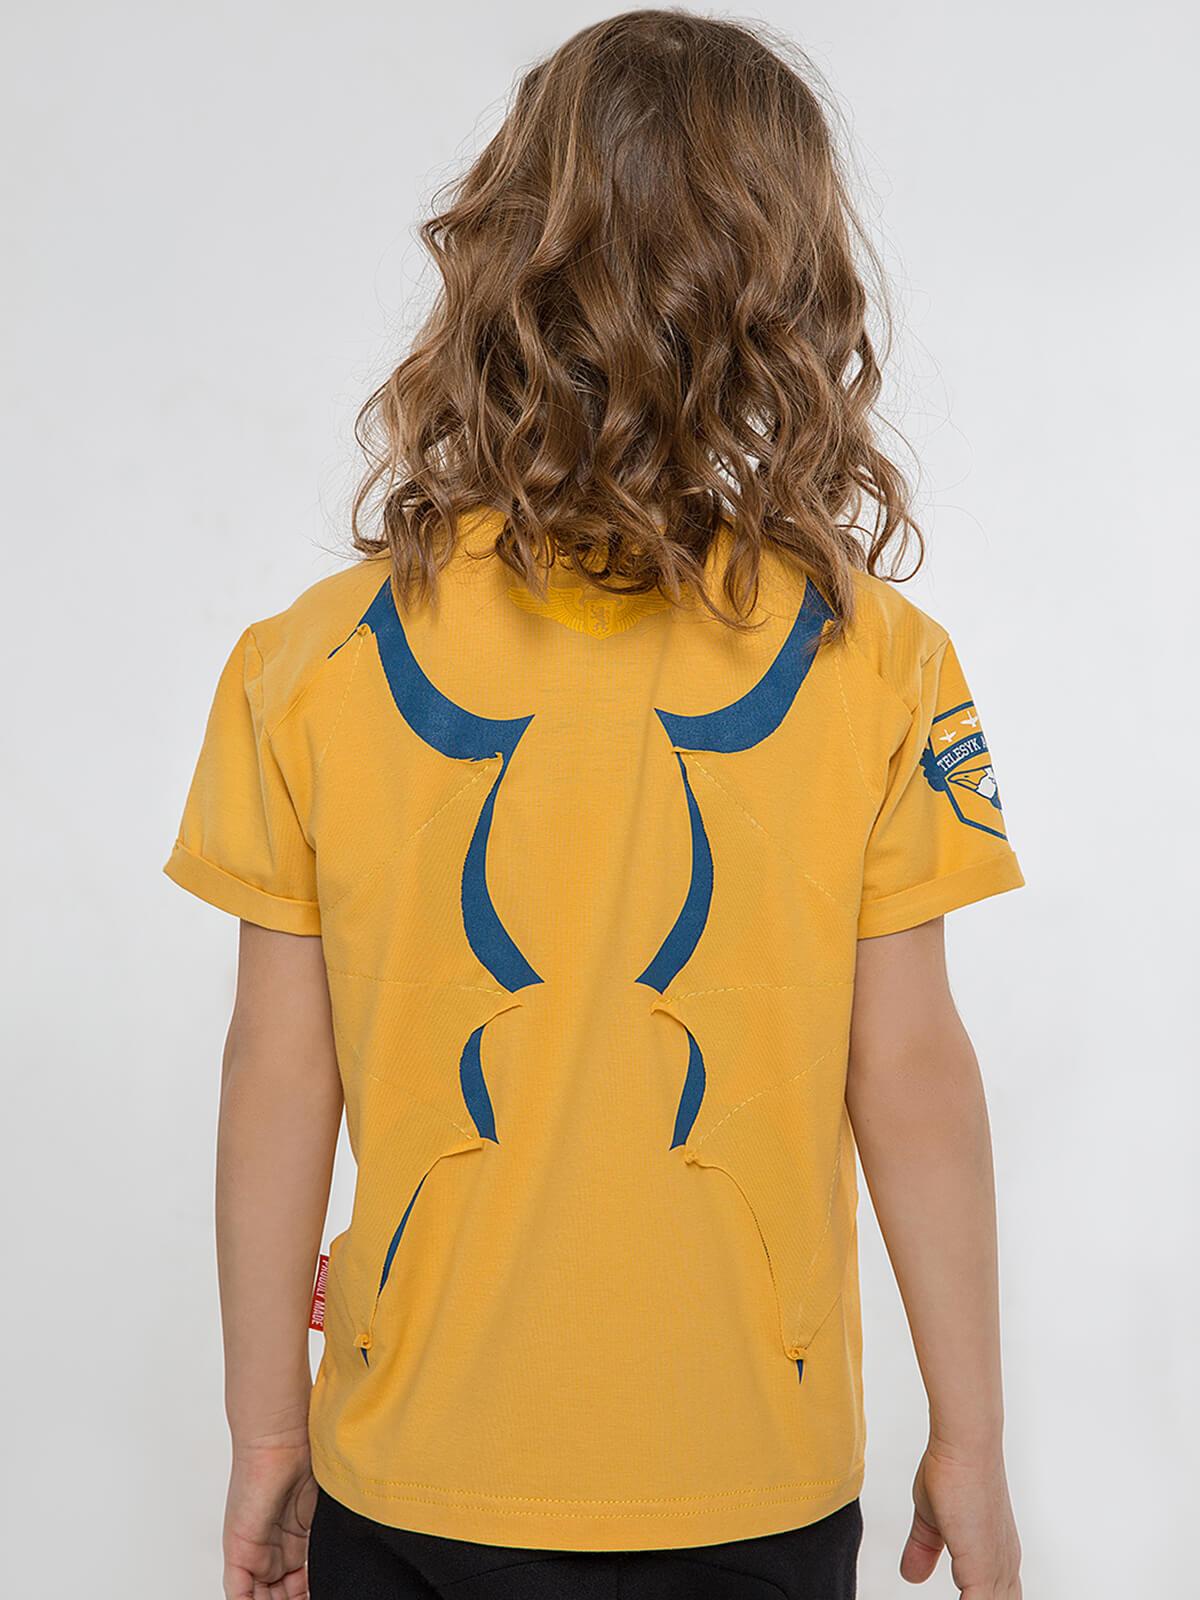 Kids T-Shirt Dragon. Color yellow.  Material: 95% cotton, 5% spandex.